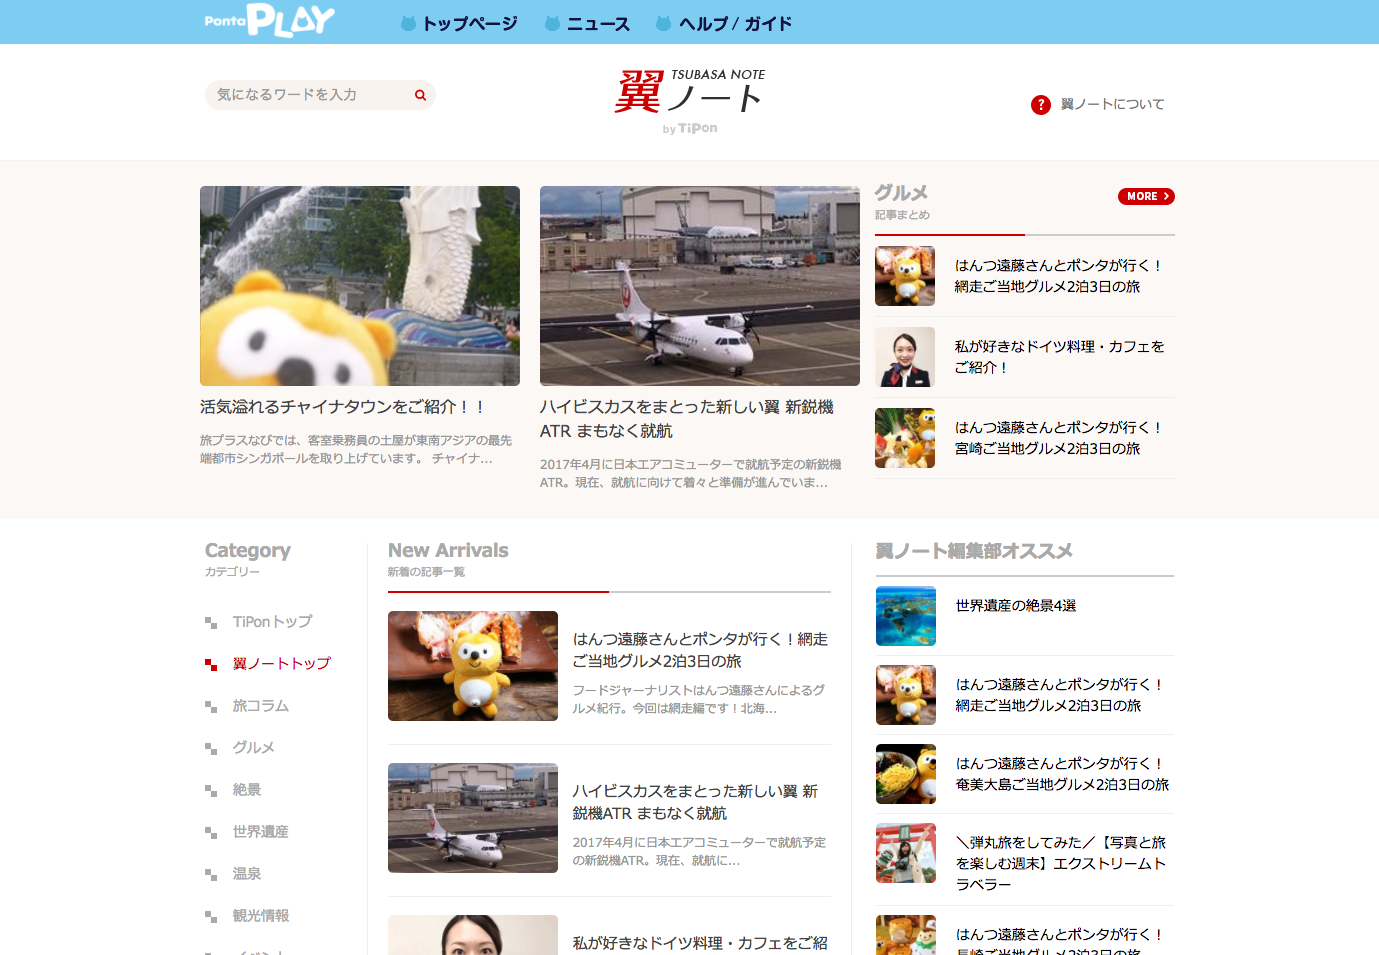 全日本空輸株式会社(ANA)「翼ノート」